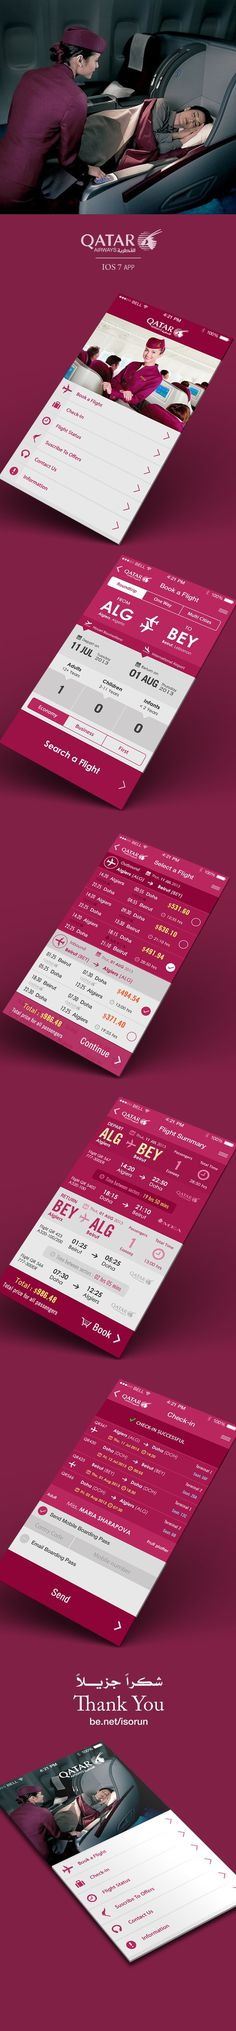 Flight Search App IOS 7 on Behance